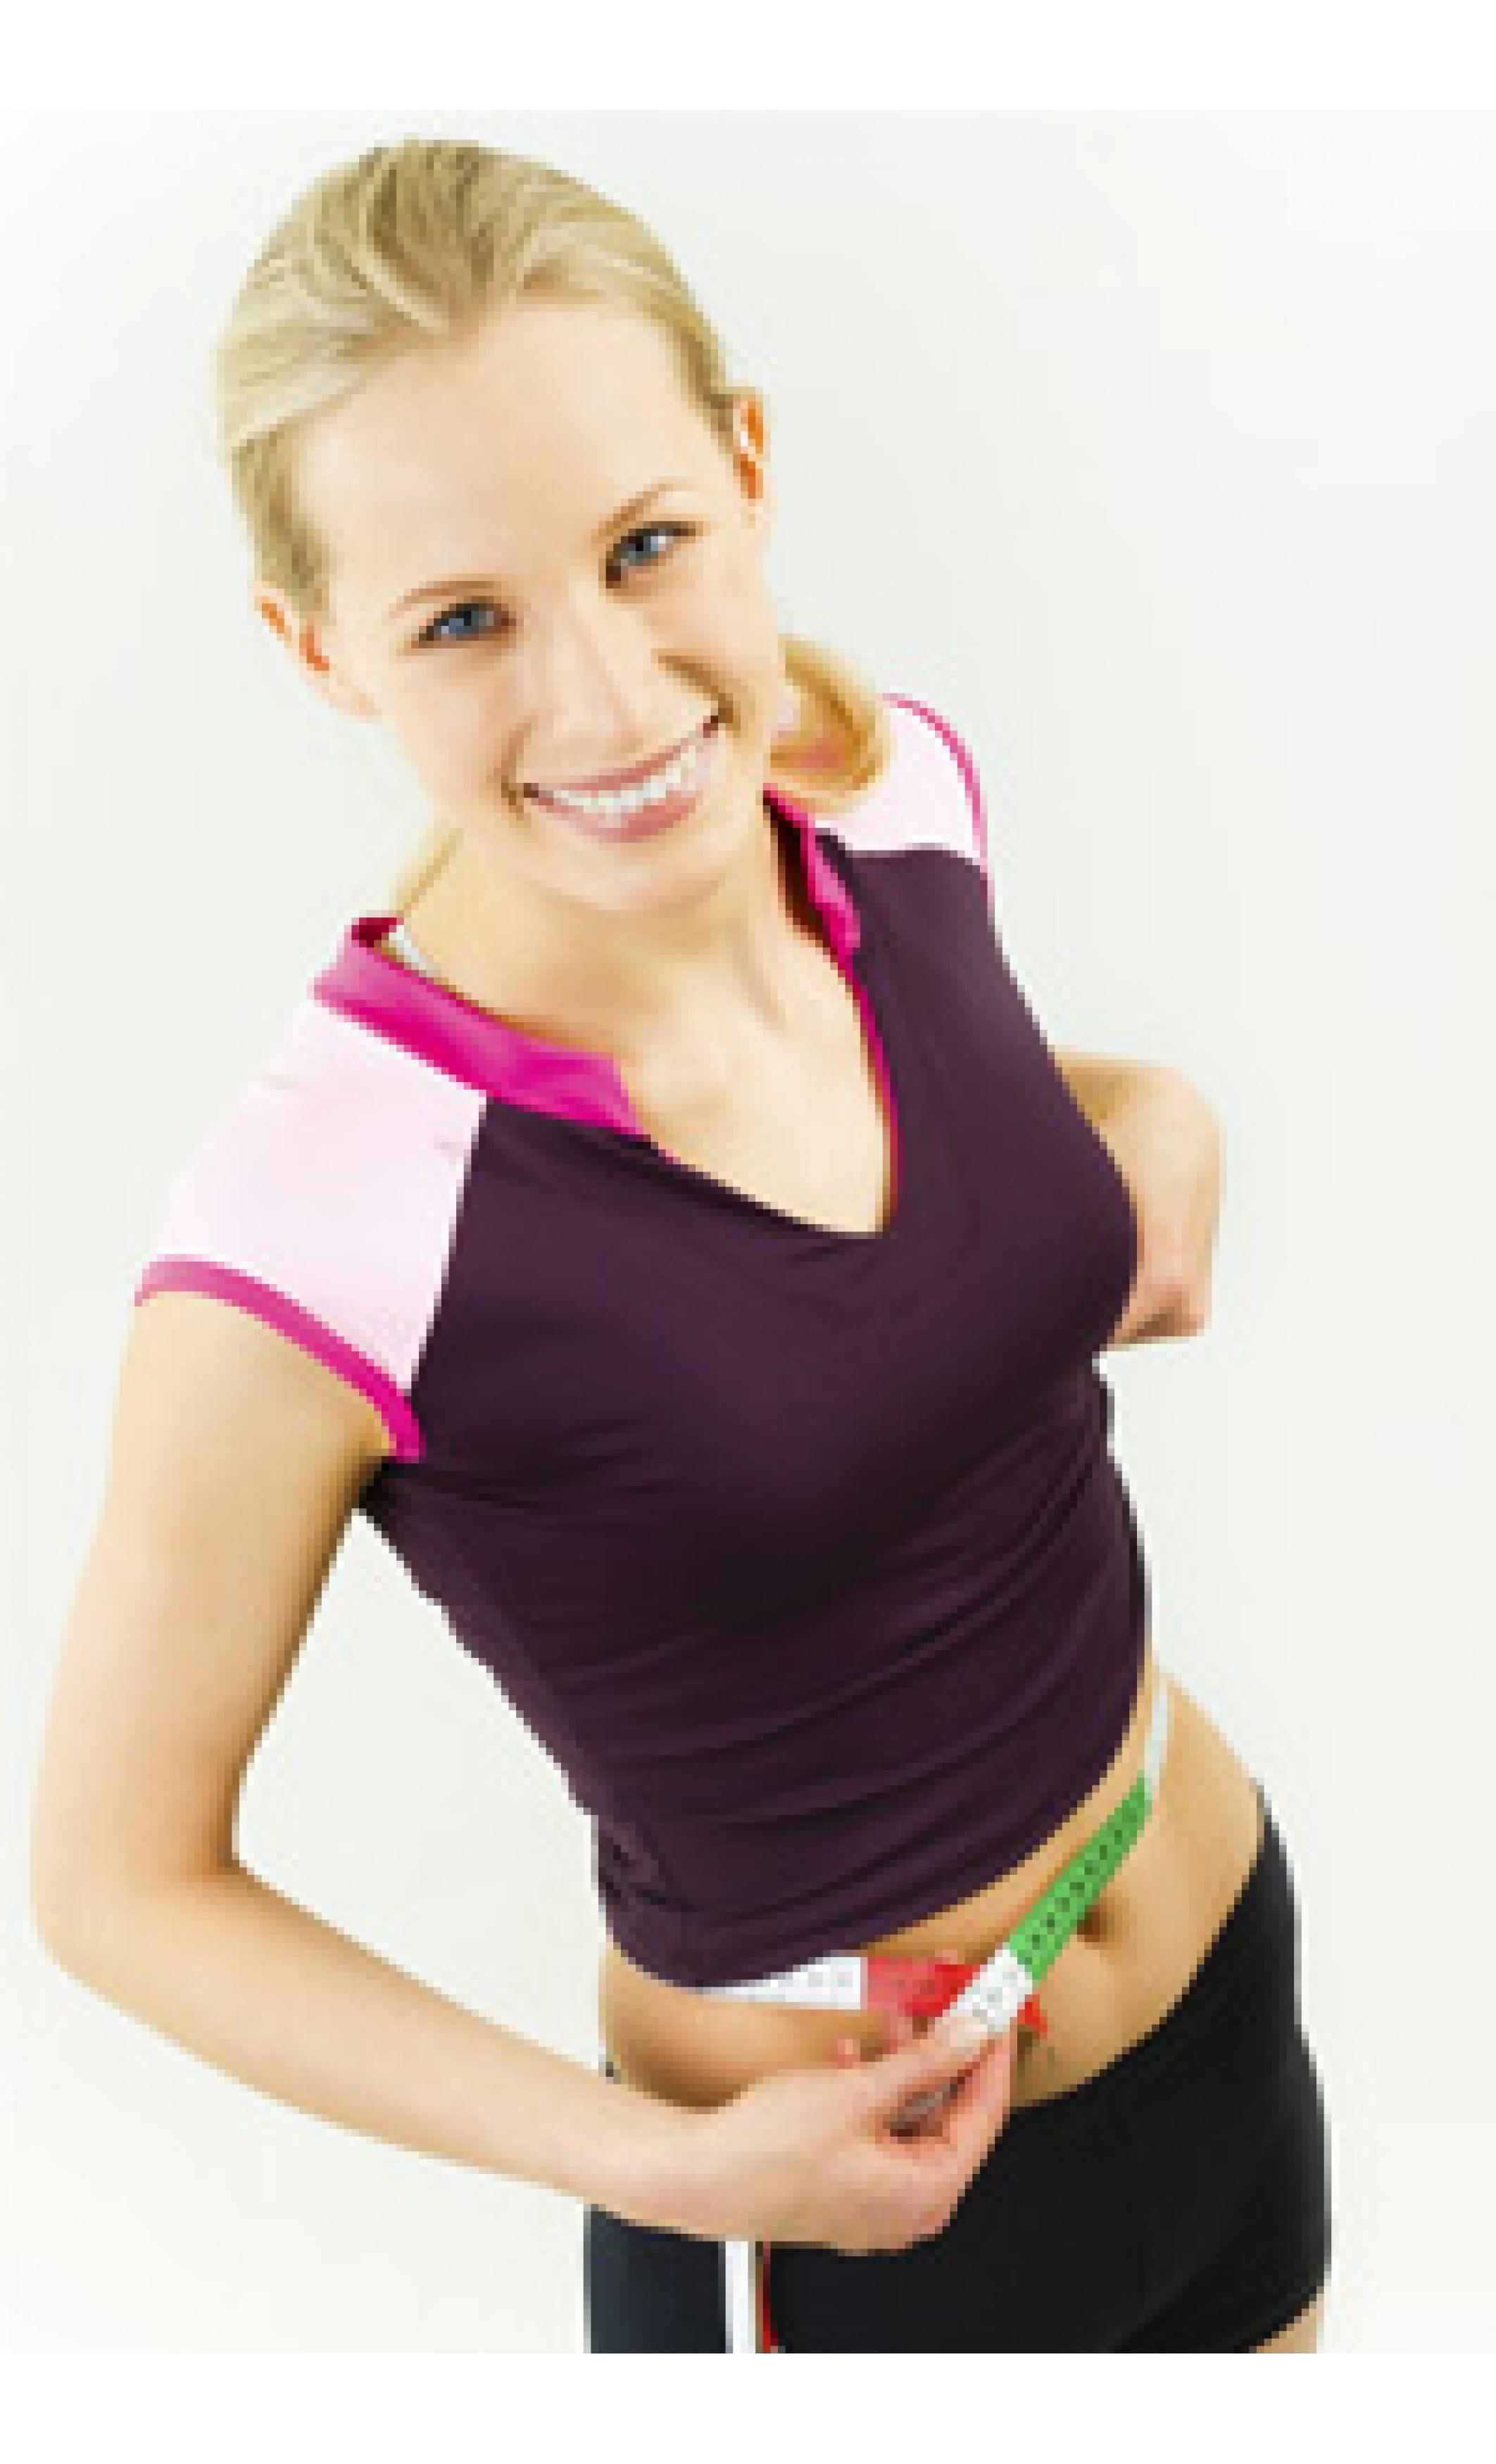 Abnehmen & Gewichtskontrolle